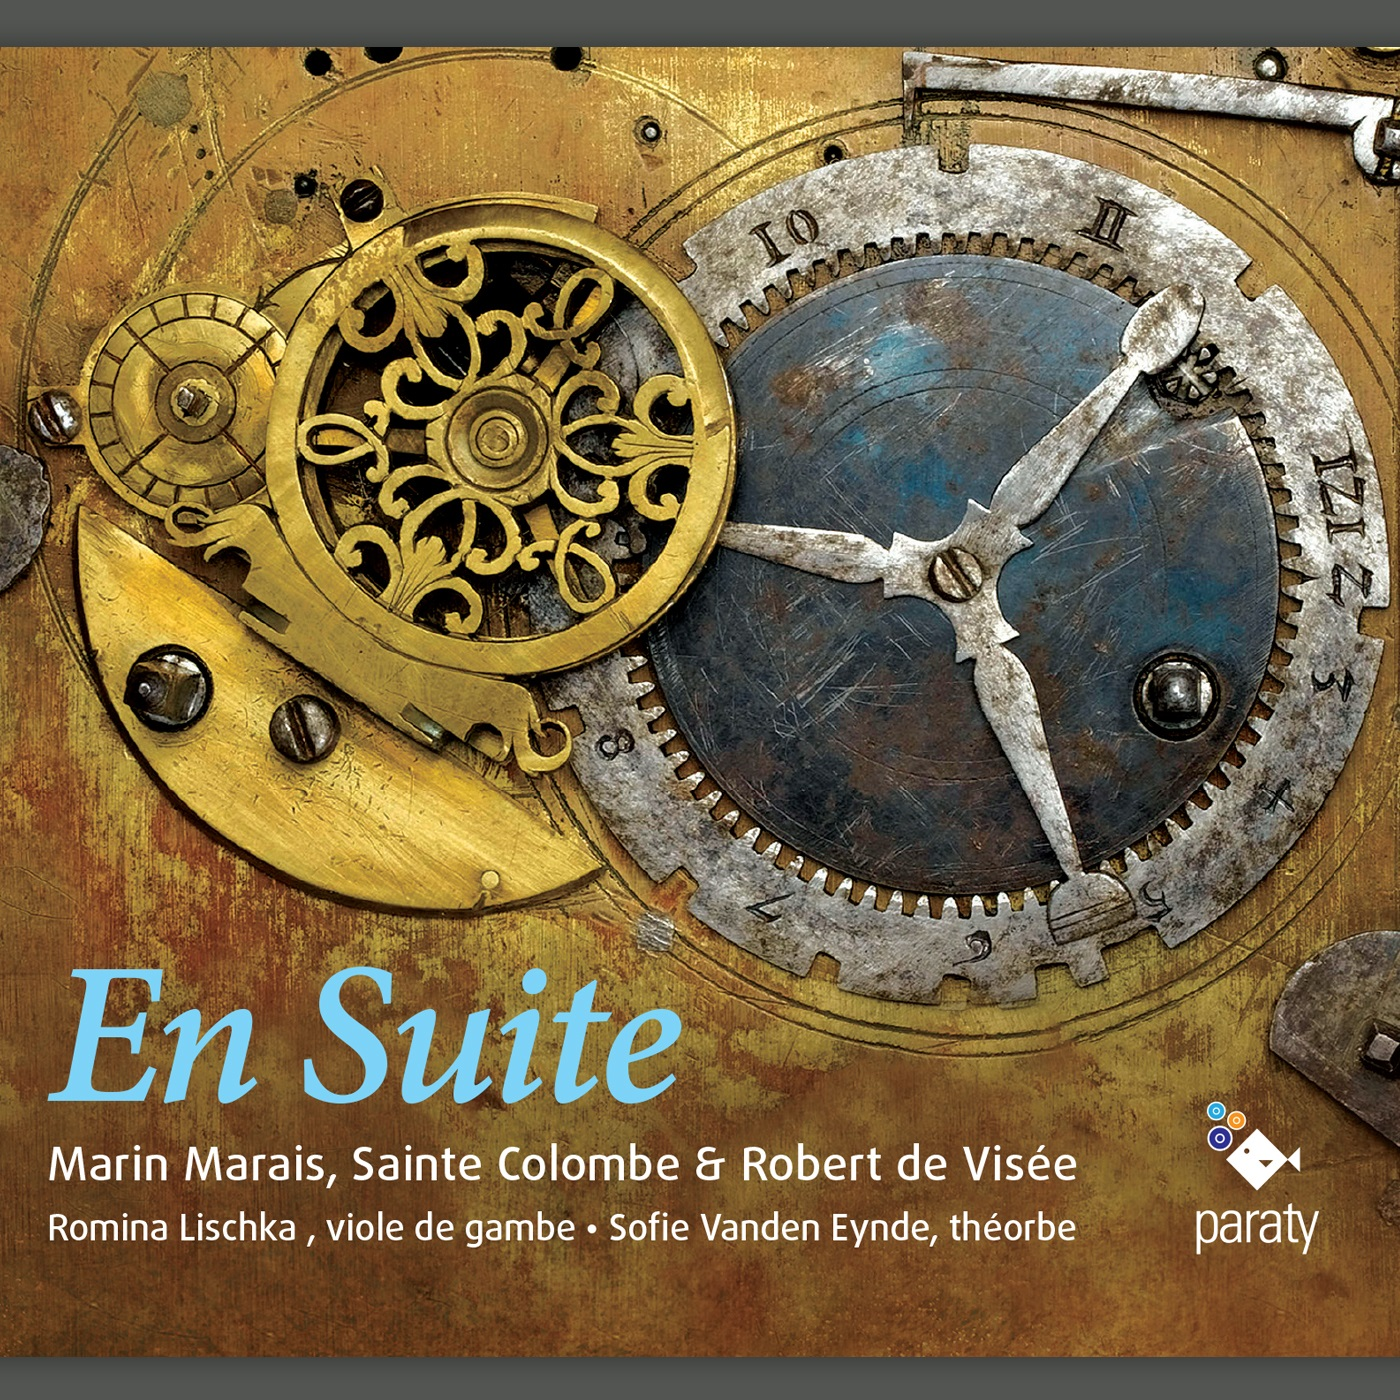 En Suite : Marin Marais, Sainte Colombe & Robert de Visée